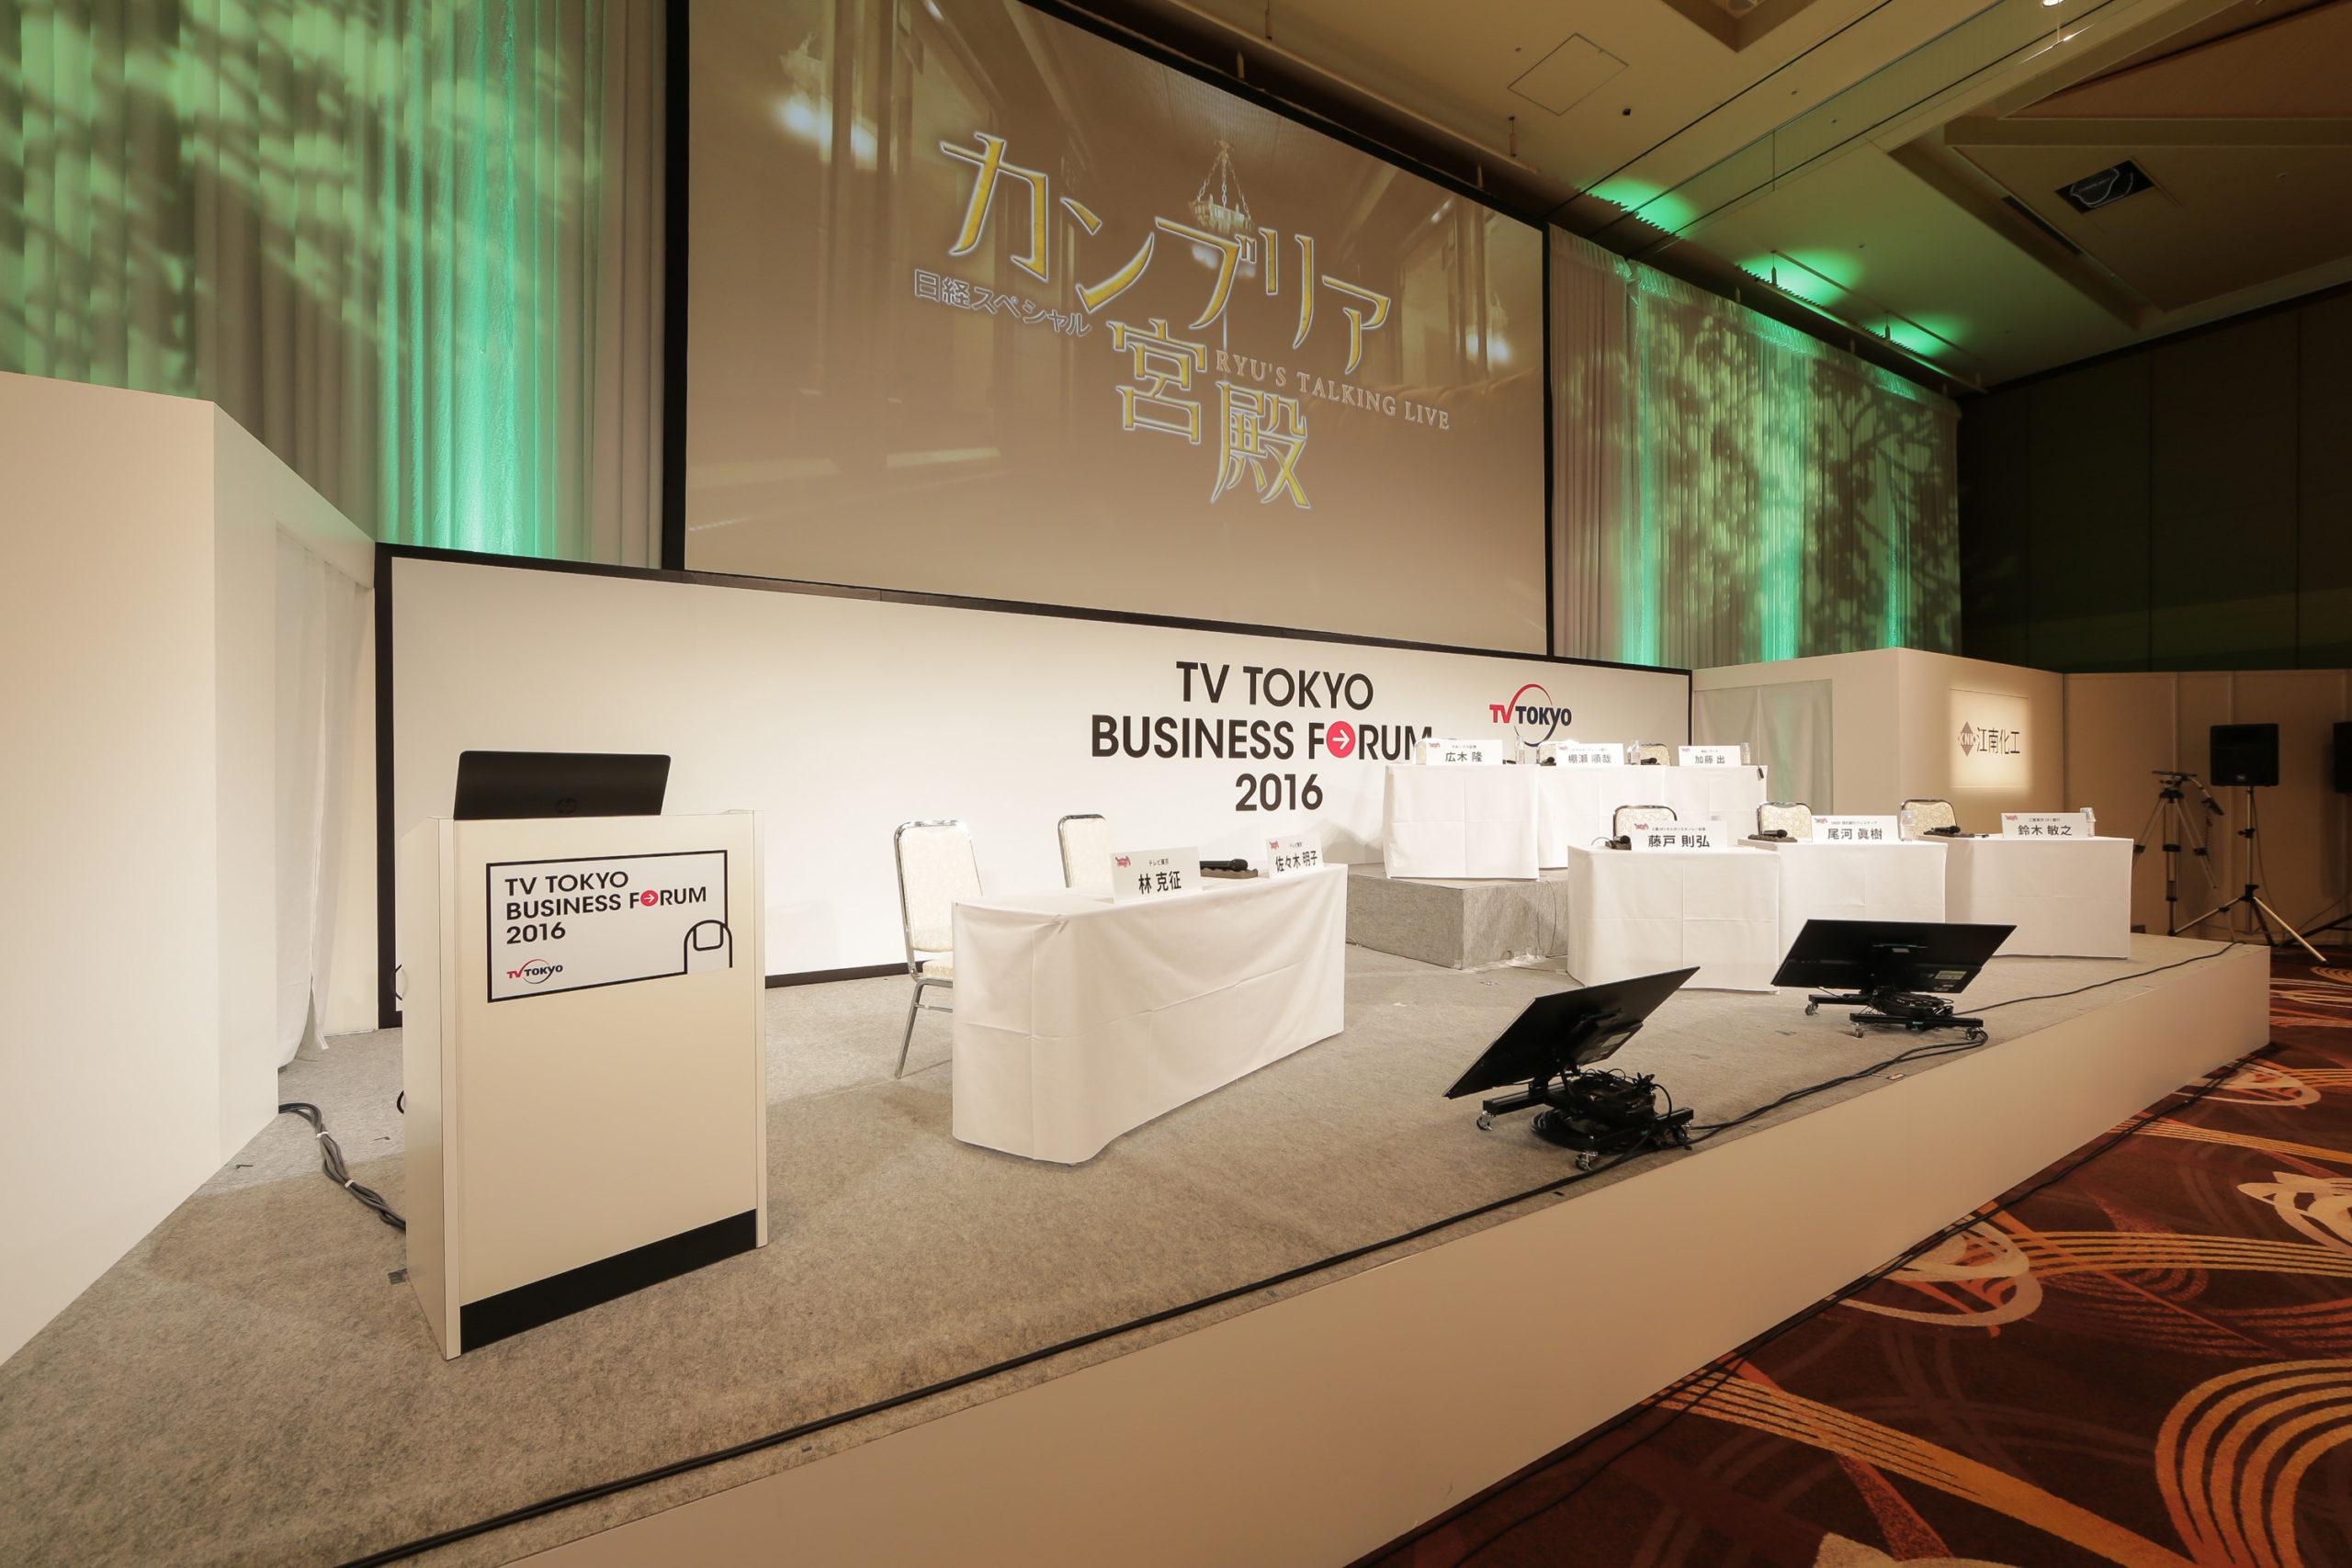 TV TOKYO Business forum 2016